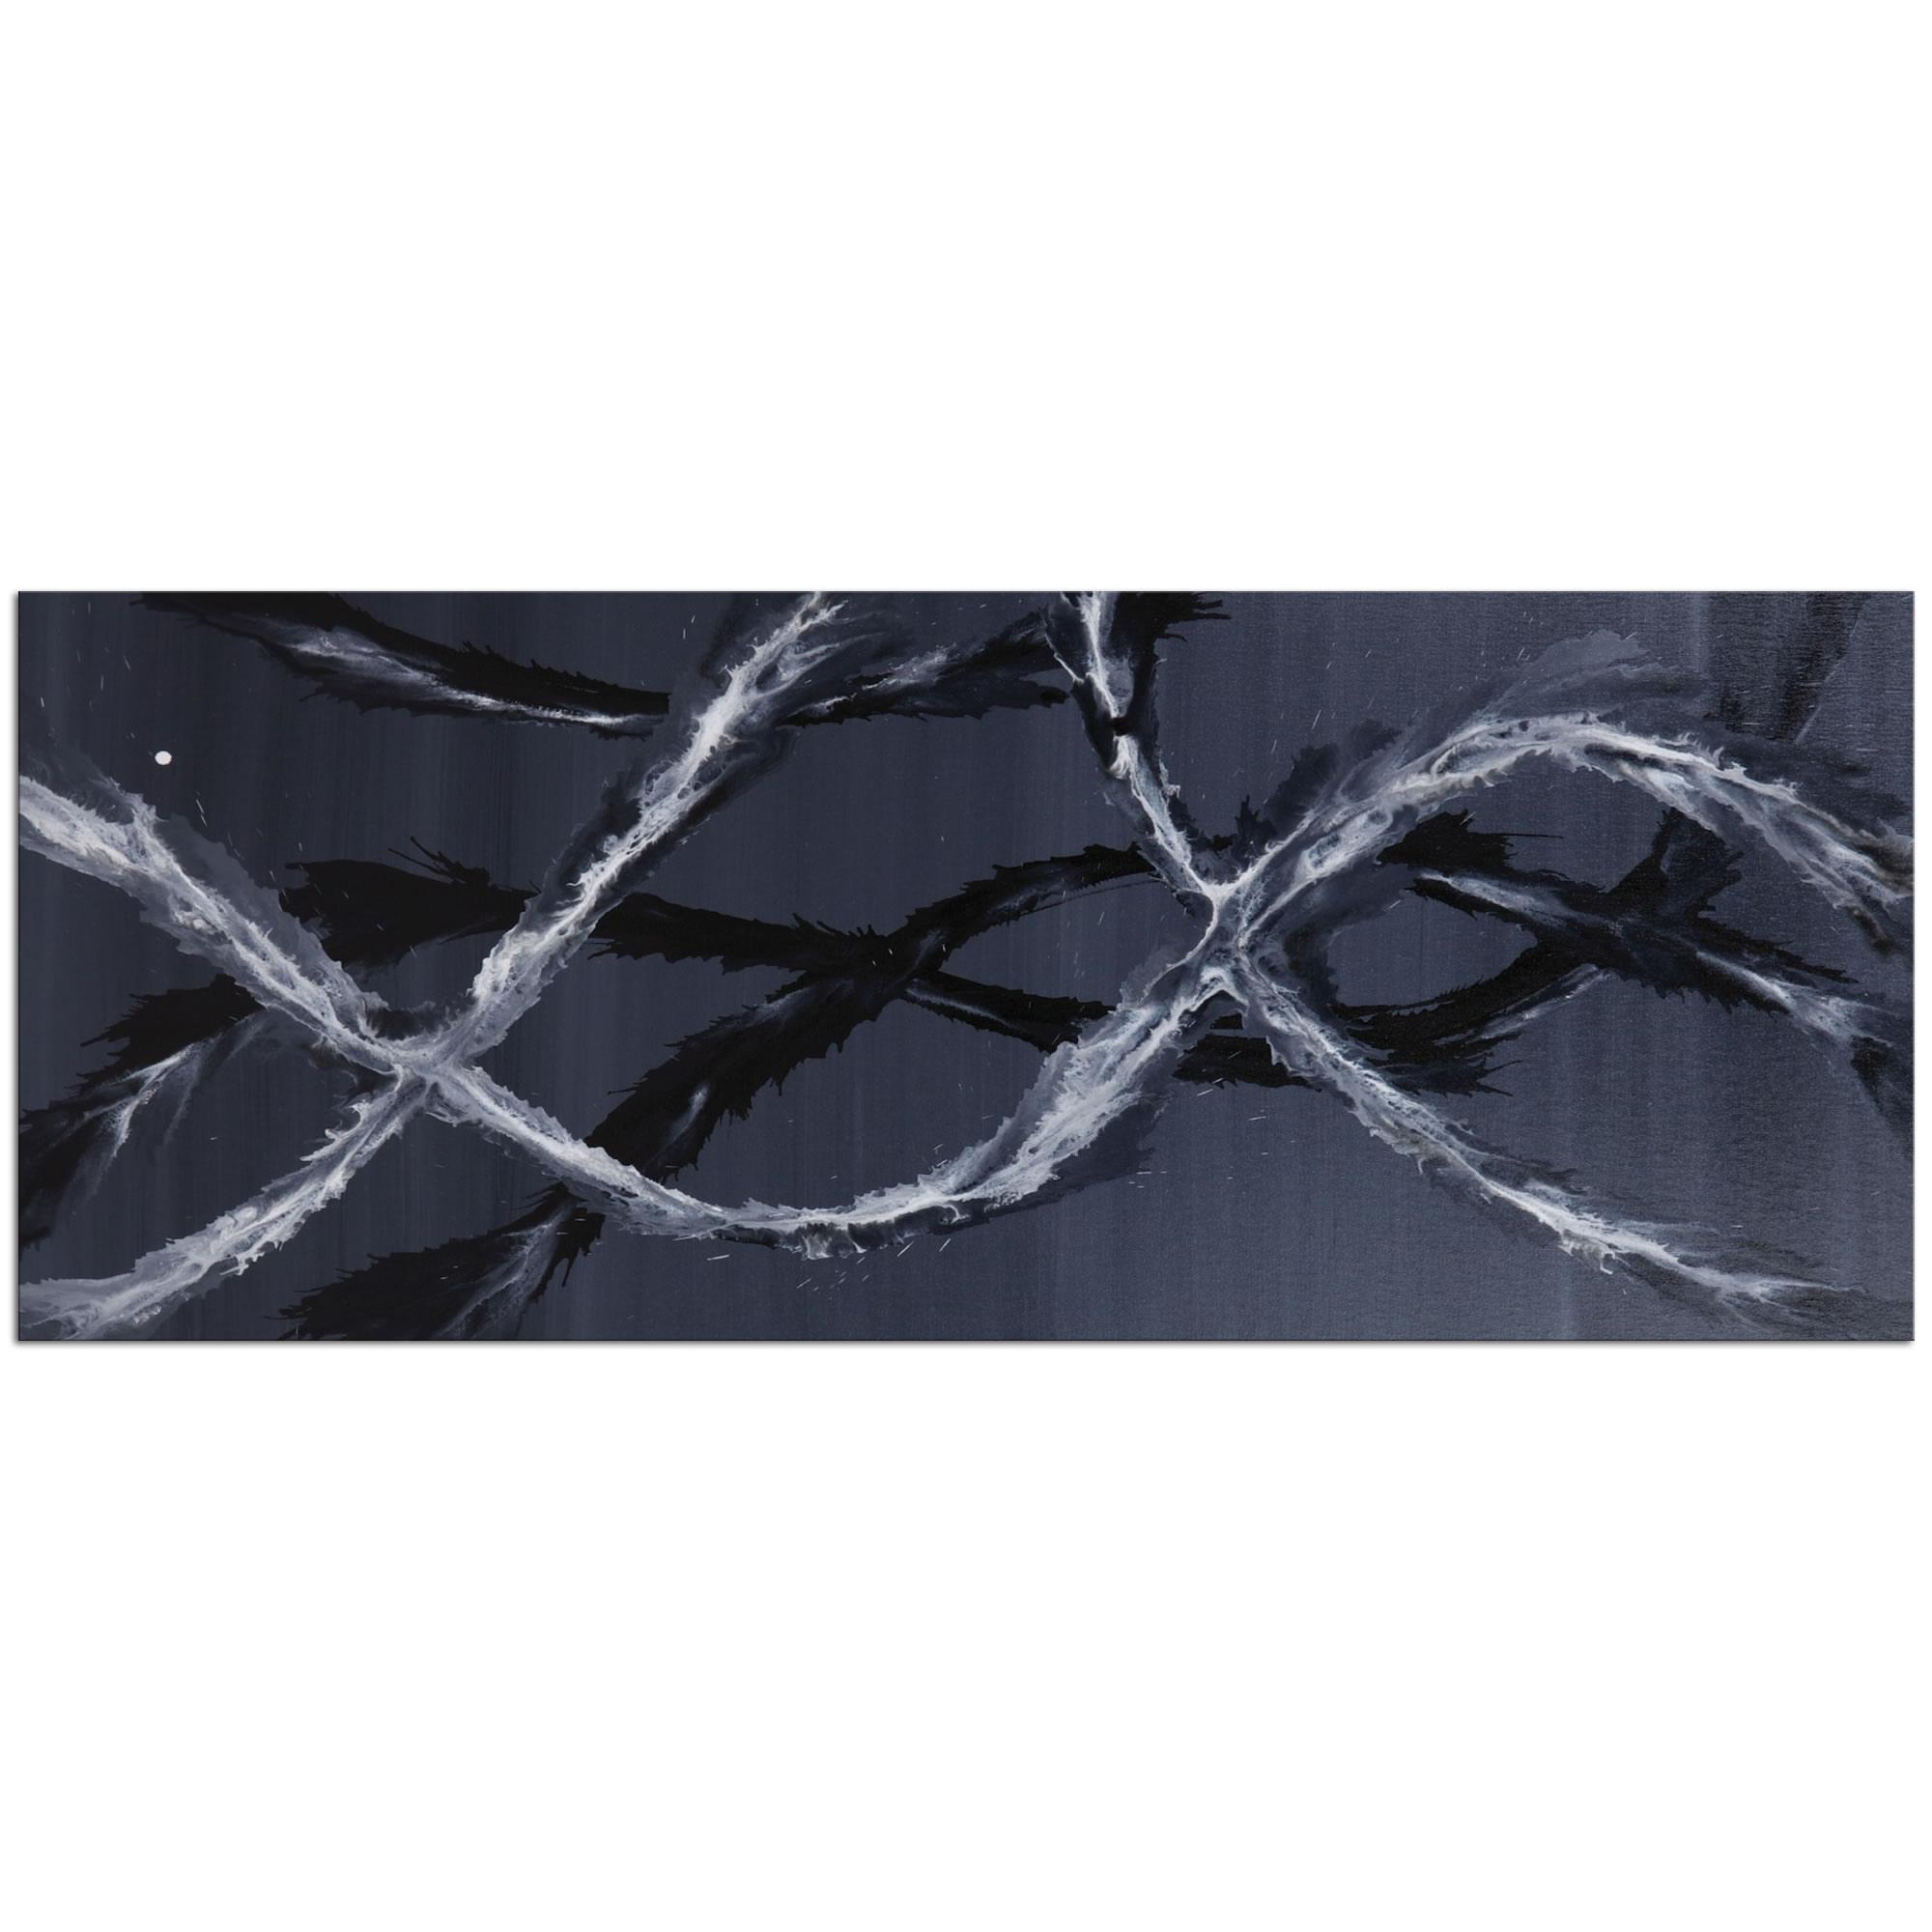 Black & White Waves : Minimalist Abstract Metal Art